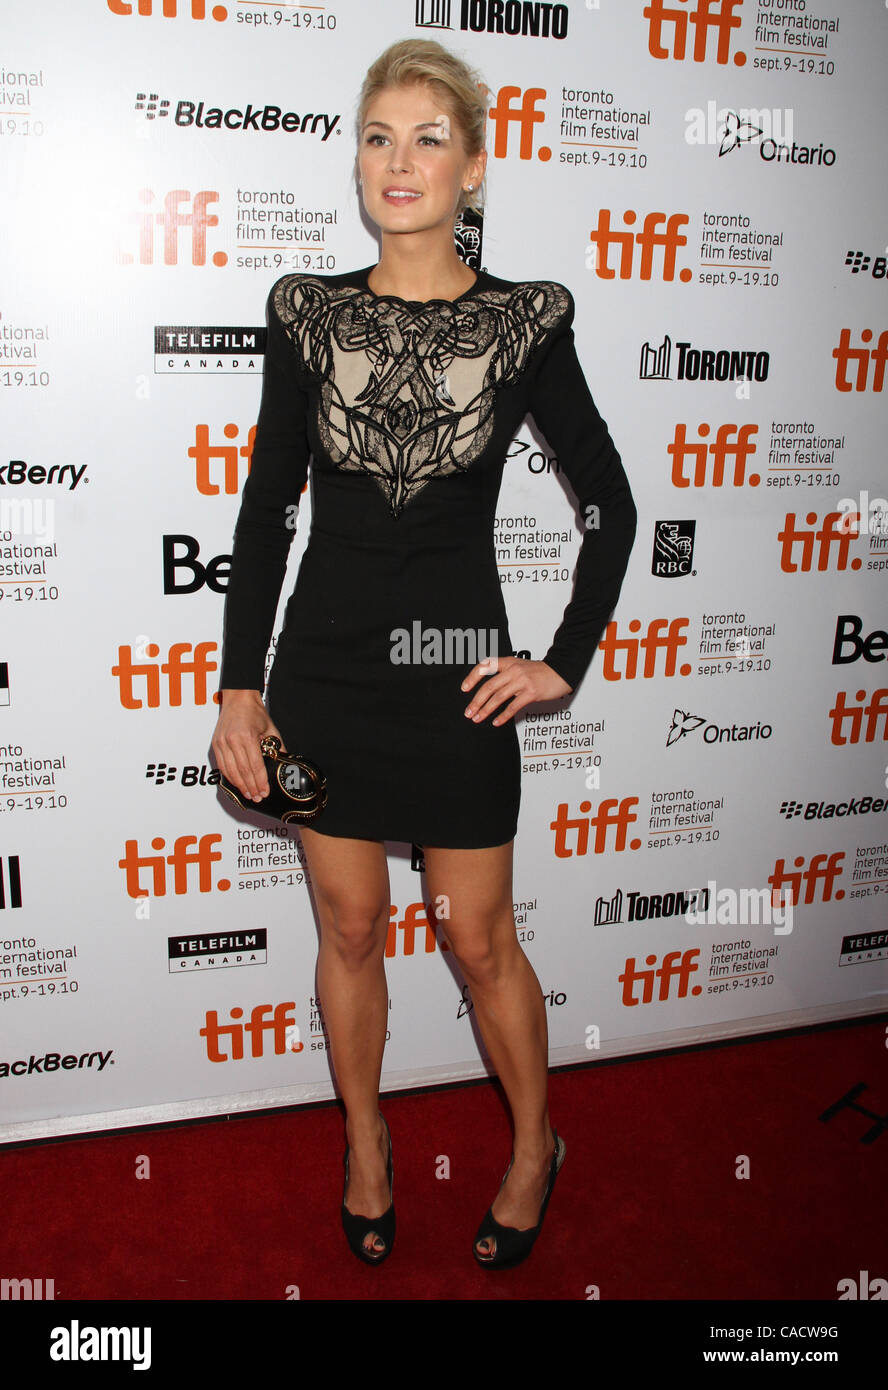 Sept. 12, 2010 - Toronto, ON, Canada - Rosamund Pike at the 2010  Toronto International Film Festival premiere of Stock Photo